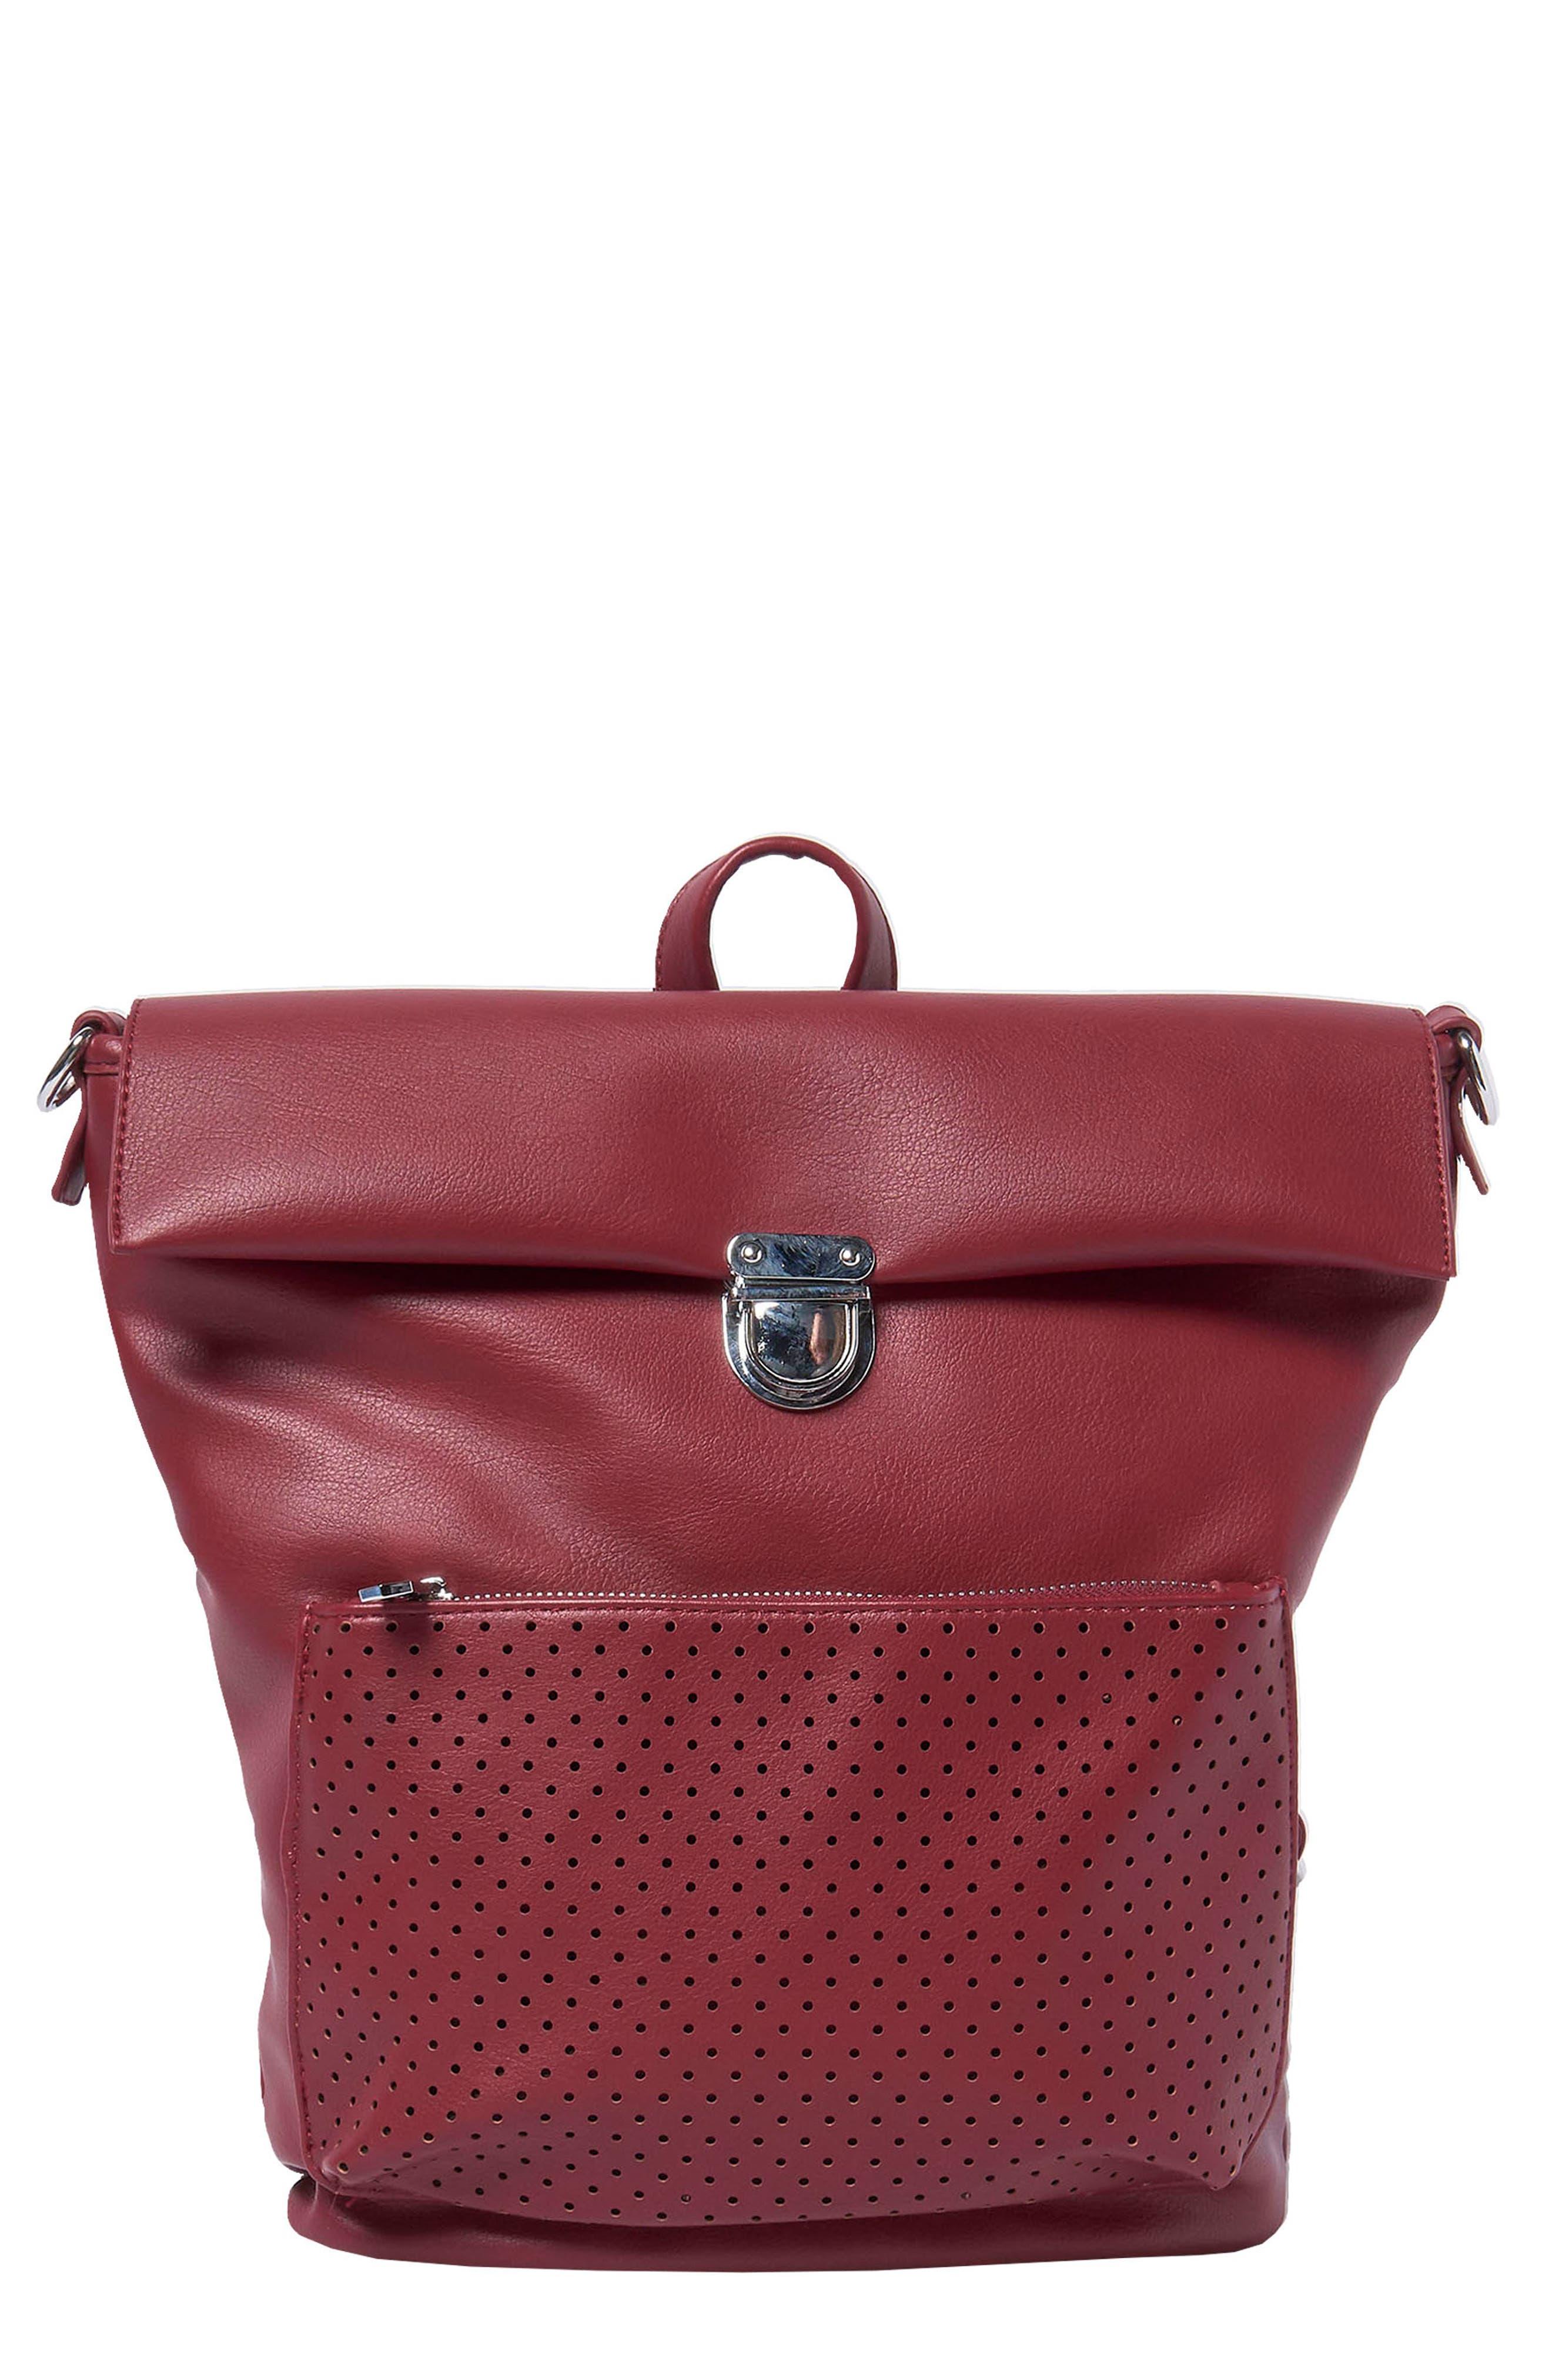 Solo Origin Vegan Leather Convertible Backpack - Burgundy in Berry